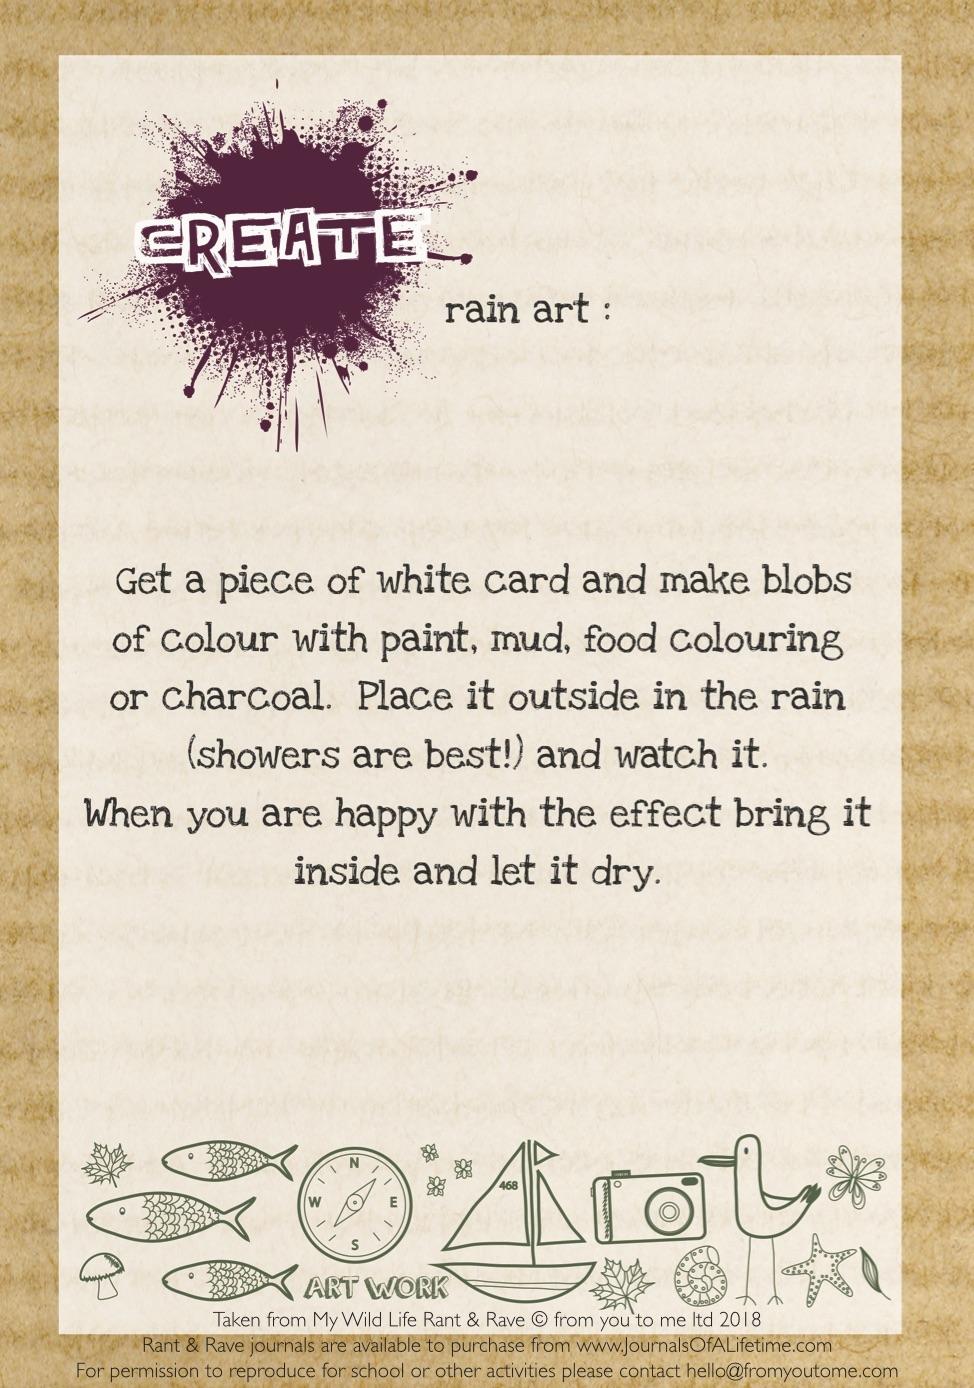 My Wild Life - Rain Art